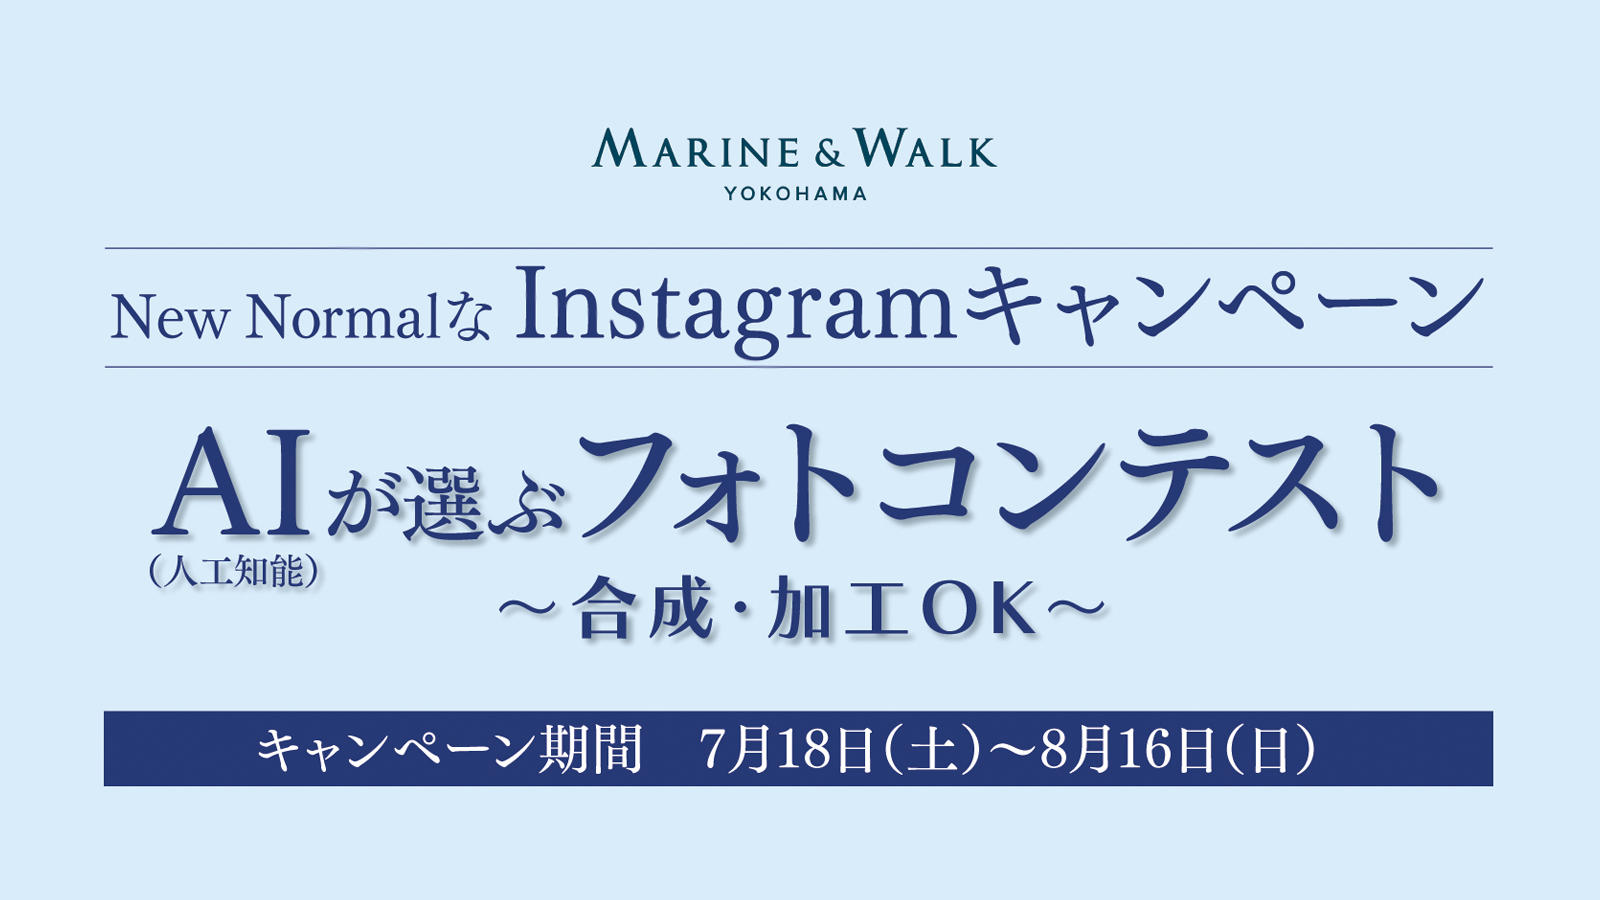 【Instagramキャンペーン】AI(人工知能) が選ぶフォトコンテスト~合成・加工 OK~